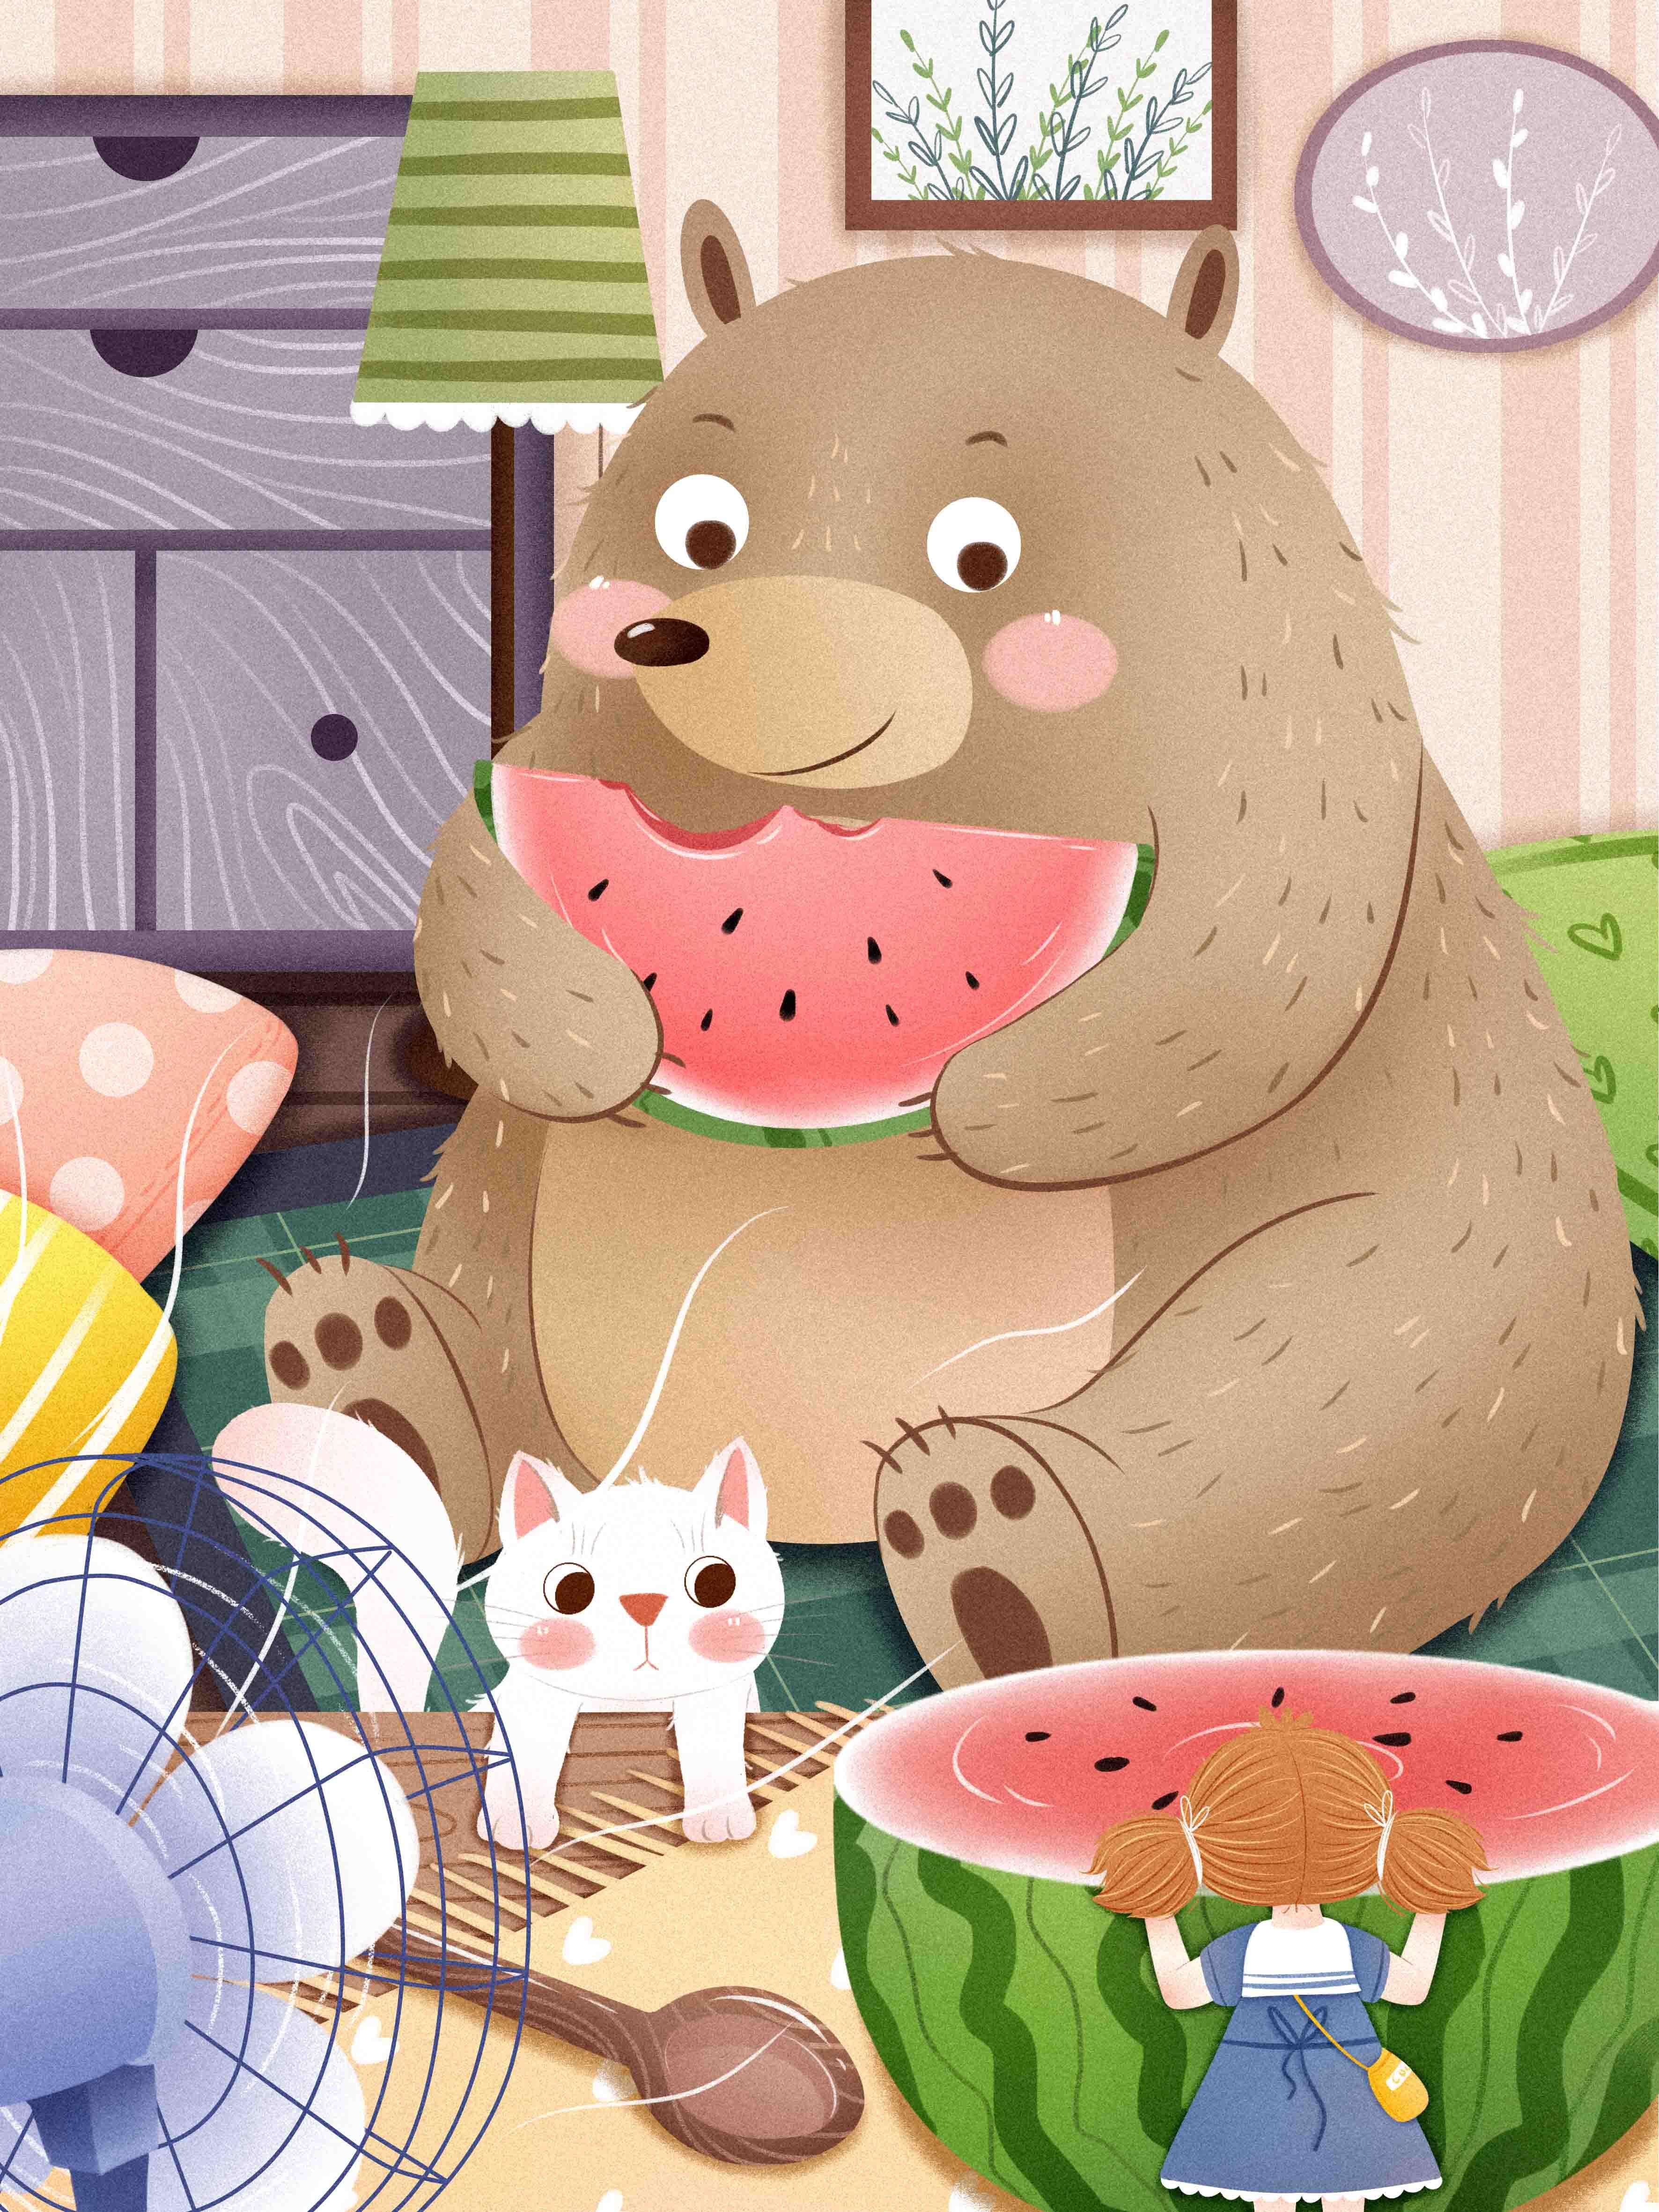 I0301001QTW  24节气之大暑小熊吃西瓜插画.jpg